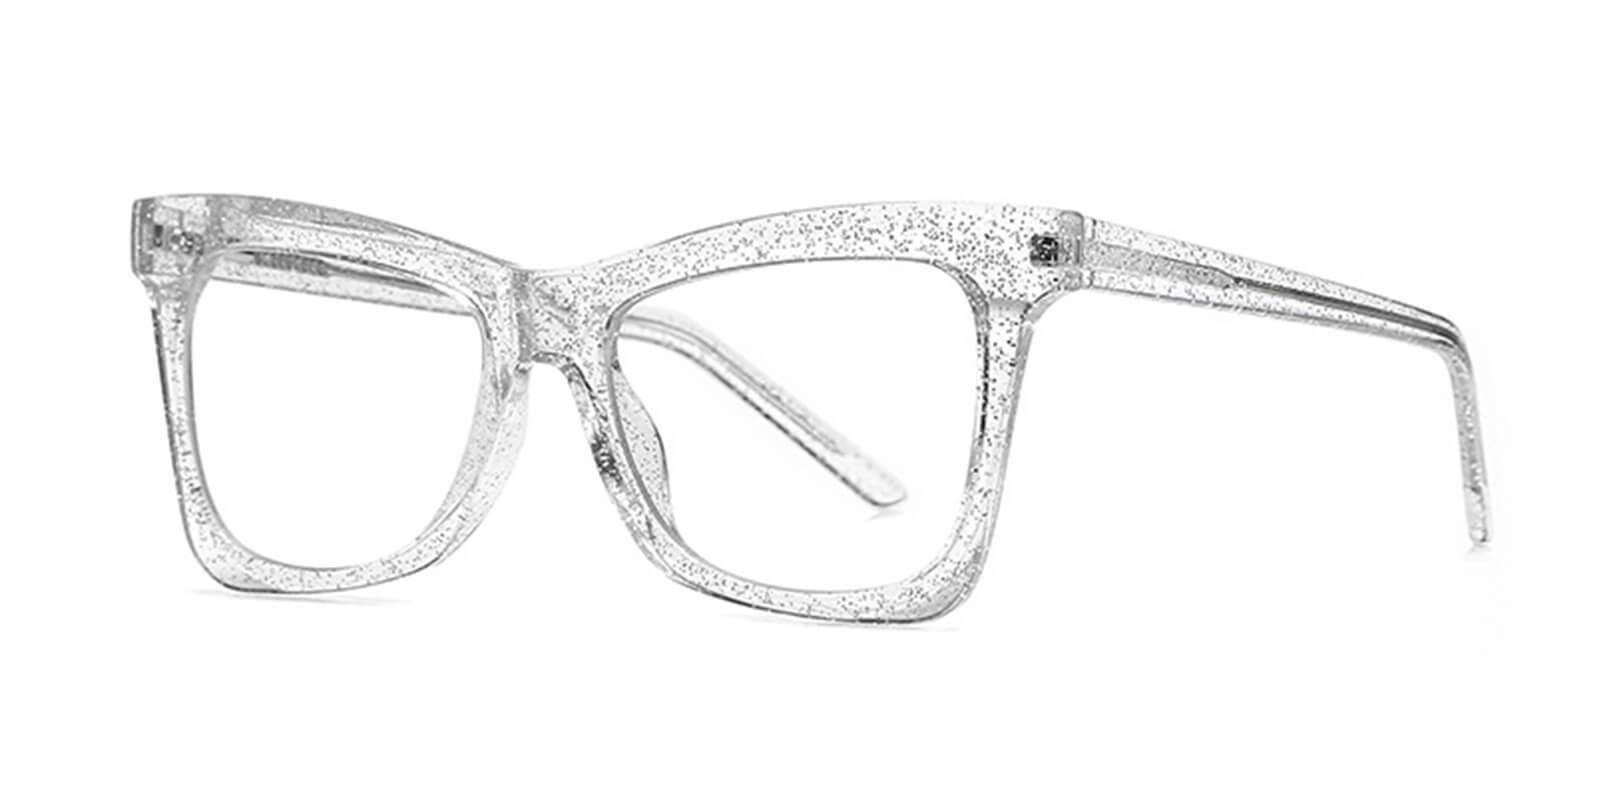 Delphine-Cat eye fashion glasses with polygonal frame design